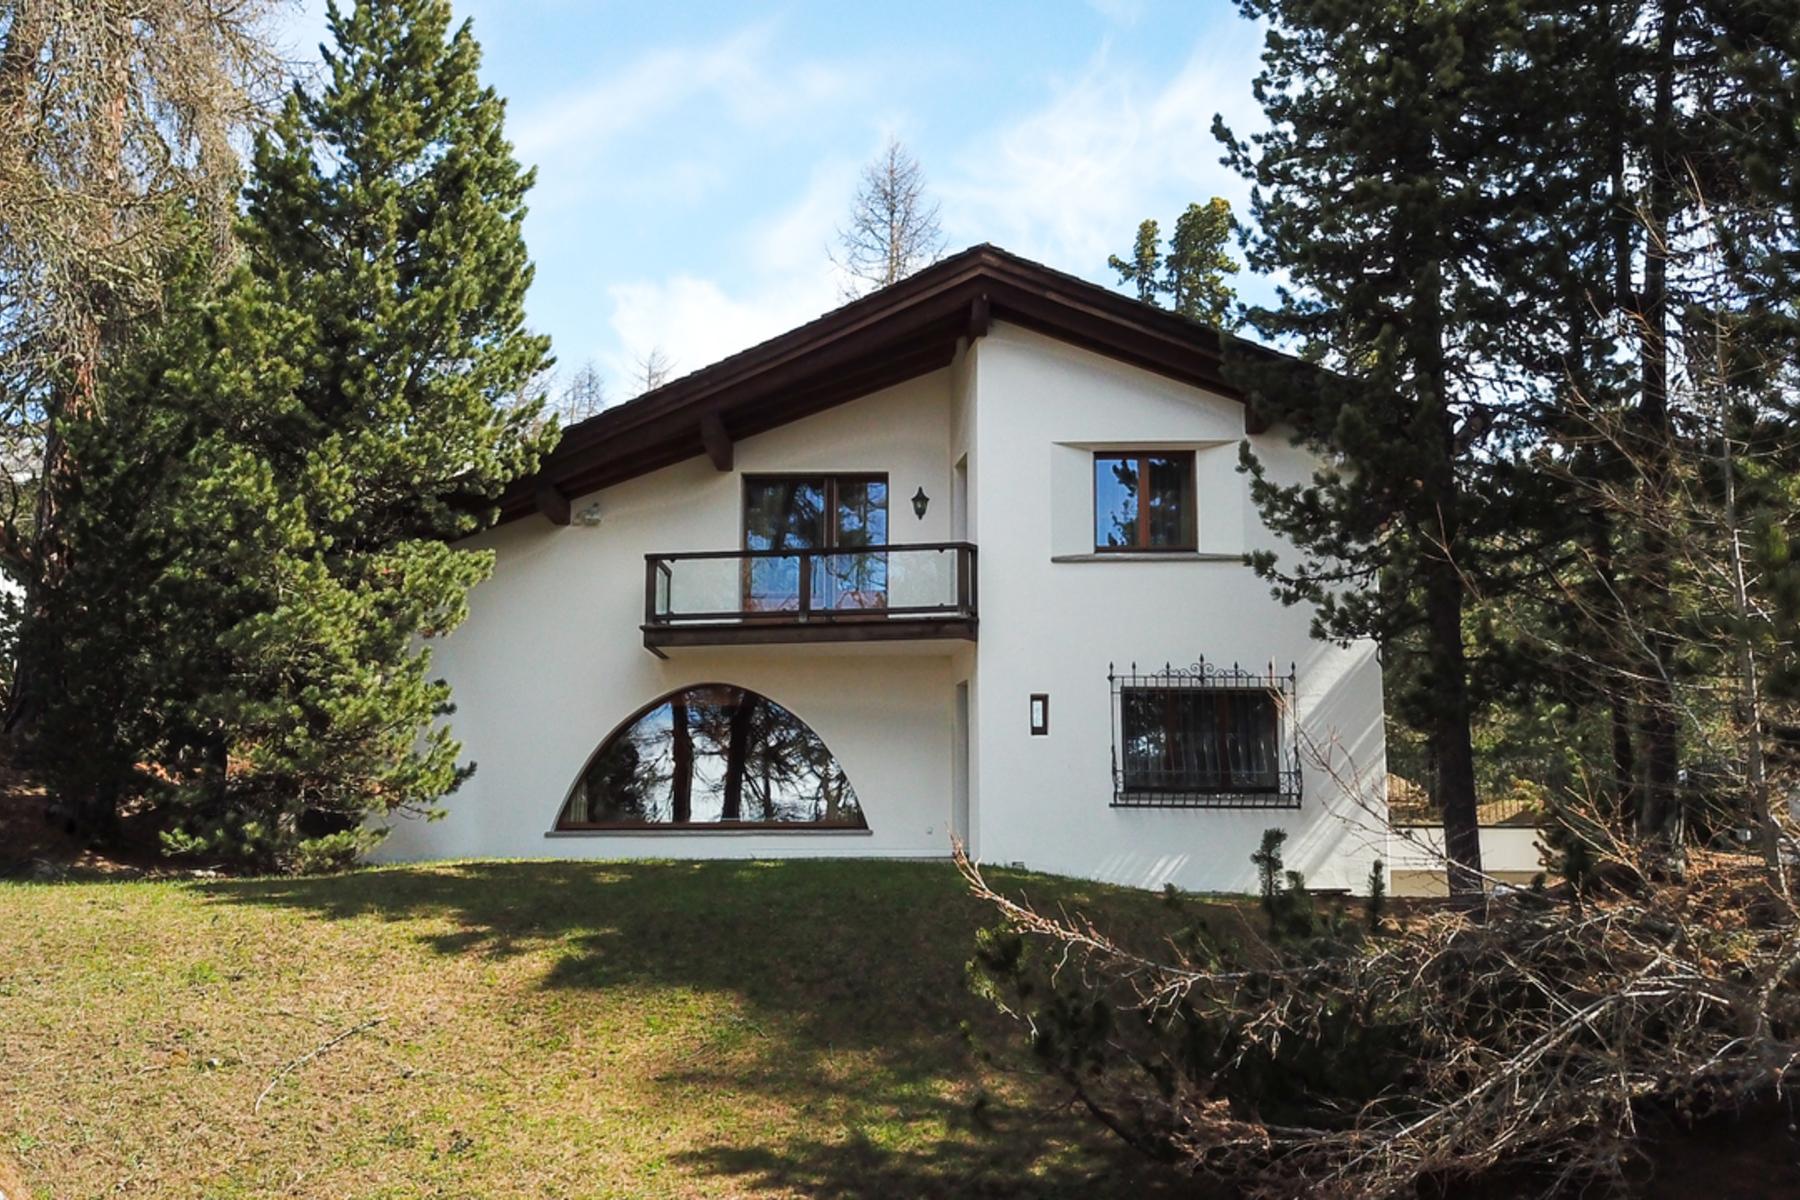 single family homes for Sale at Chalet in prestigious Suvretta area St. Moritz, Grisons 7500 Switzerland